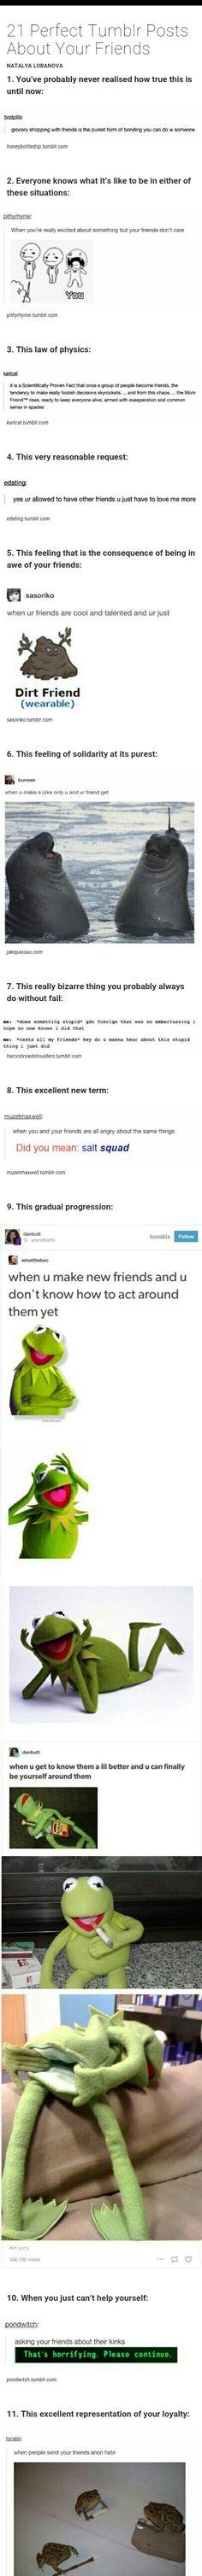 Friend friends friendship funny haha lol